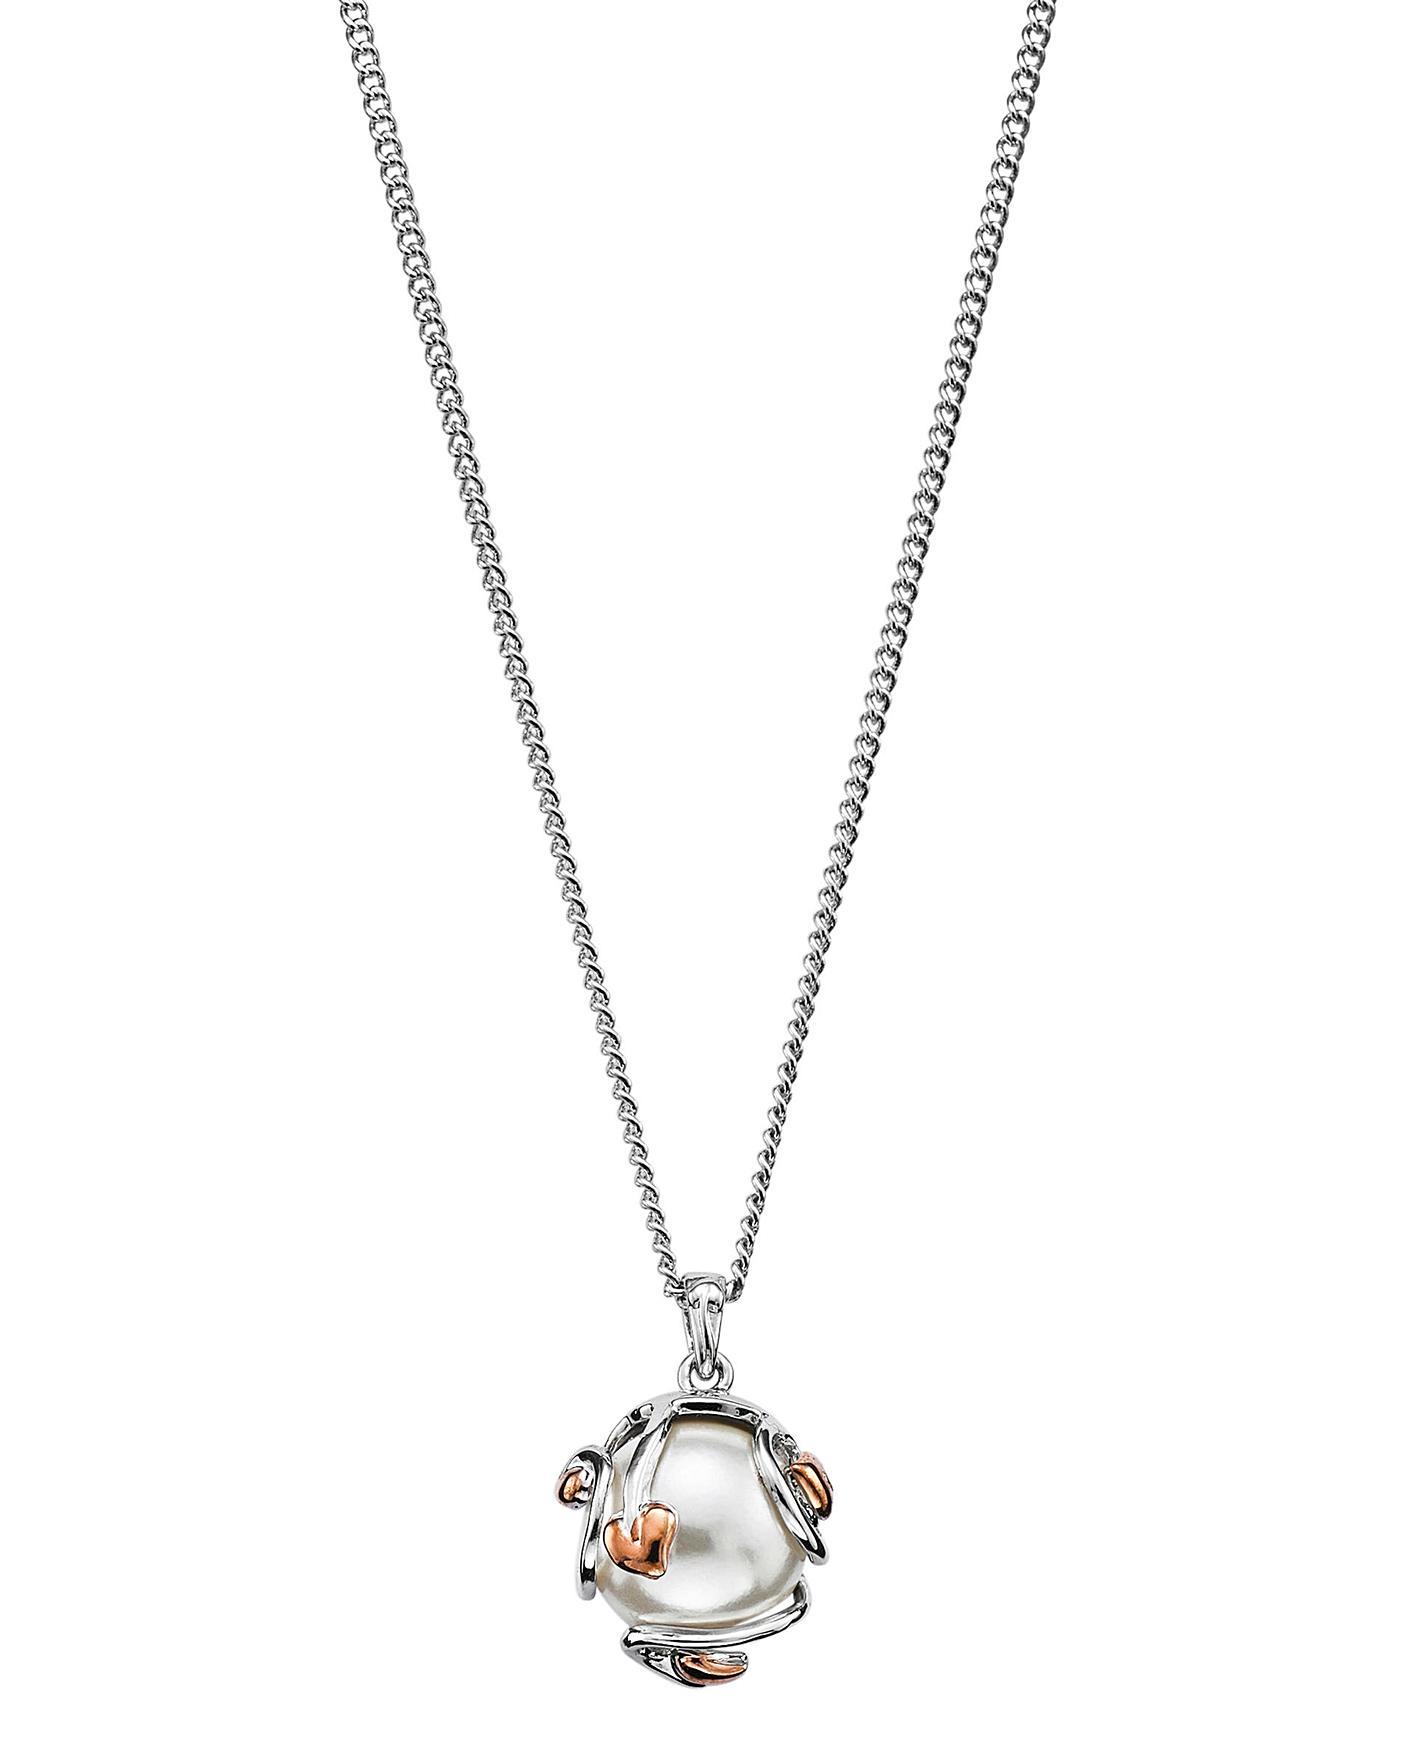 11e2fb1e4ad8f Clogau Silver And 9ct Rose Gold Tree Of Life Pearl Pendant - Best ...